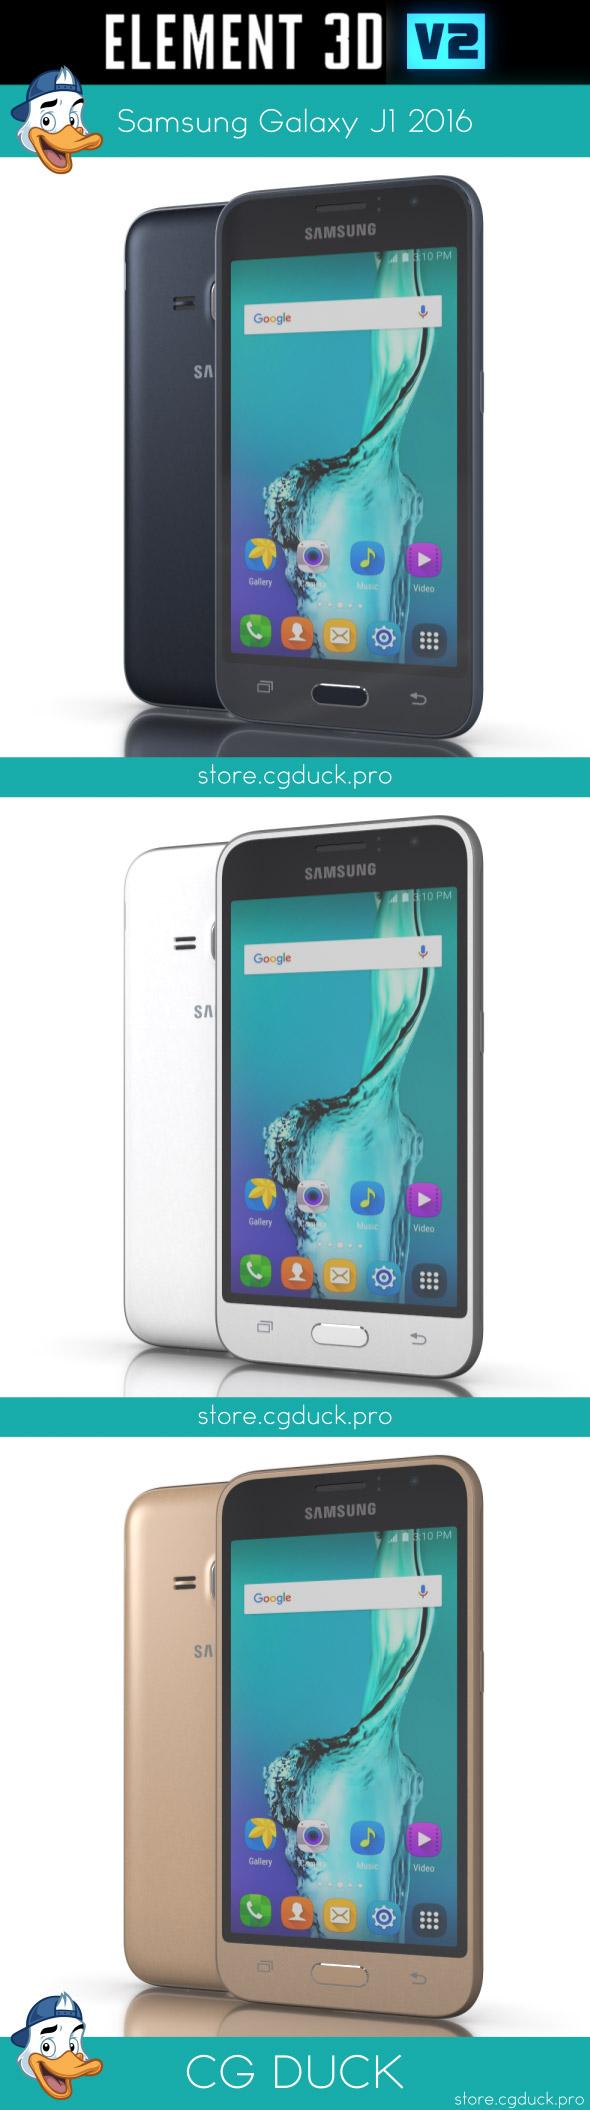 Samsung galaxy j7 for element 3d - Samsung Galaxy J7 For Element 3d 55